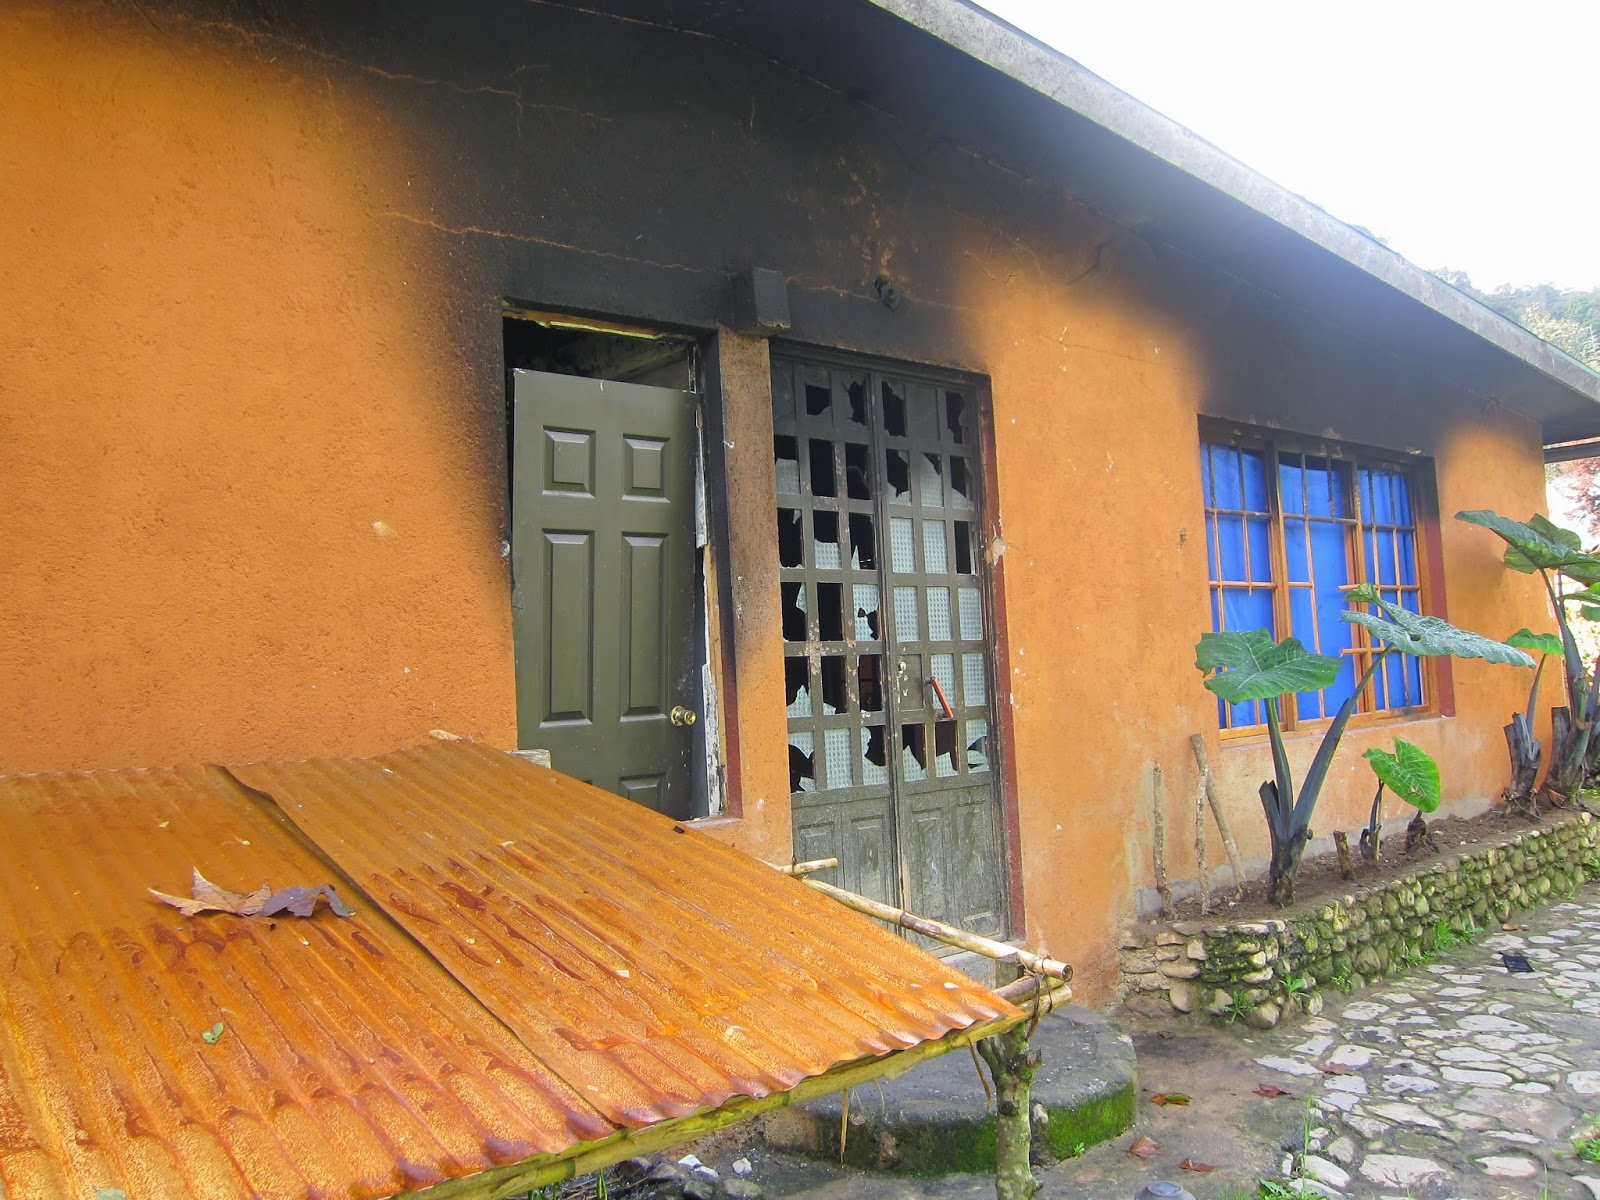 Eloxochitlan, Oaxaca, December 14, Violence, Elisa Zepeda